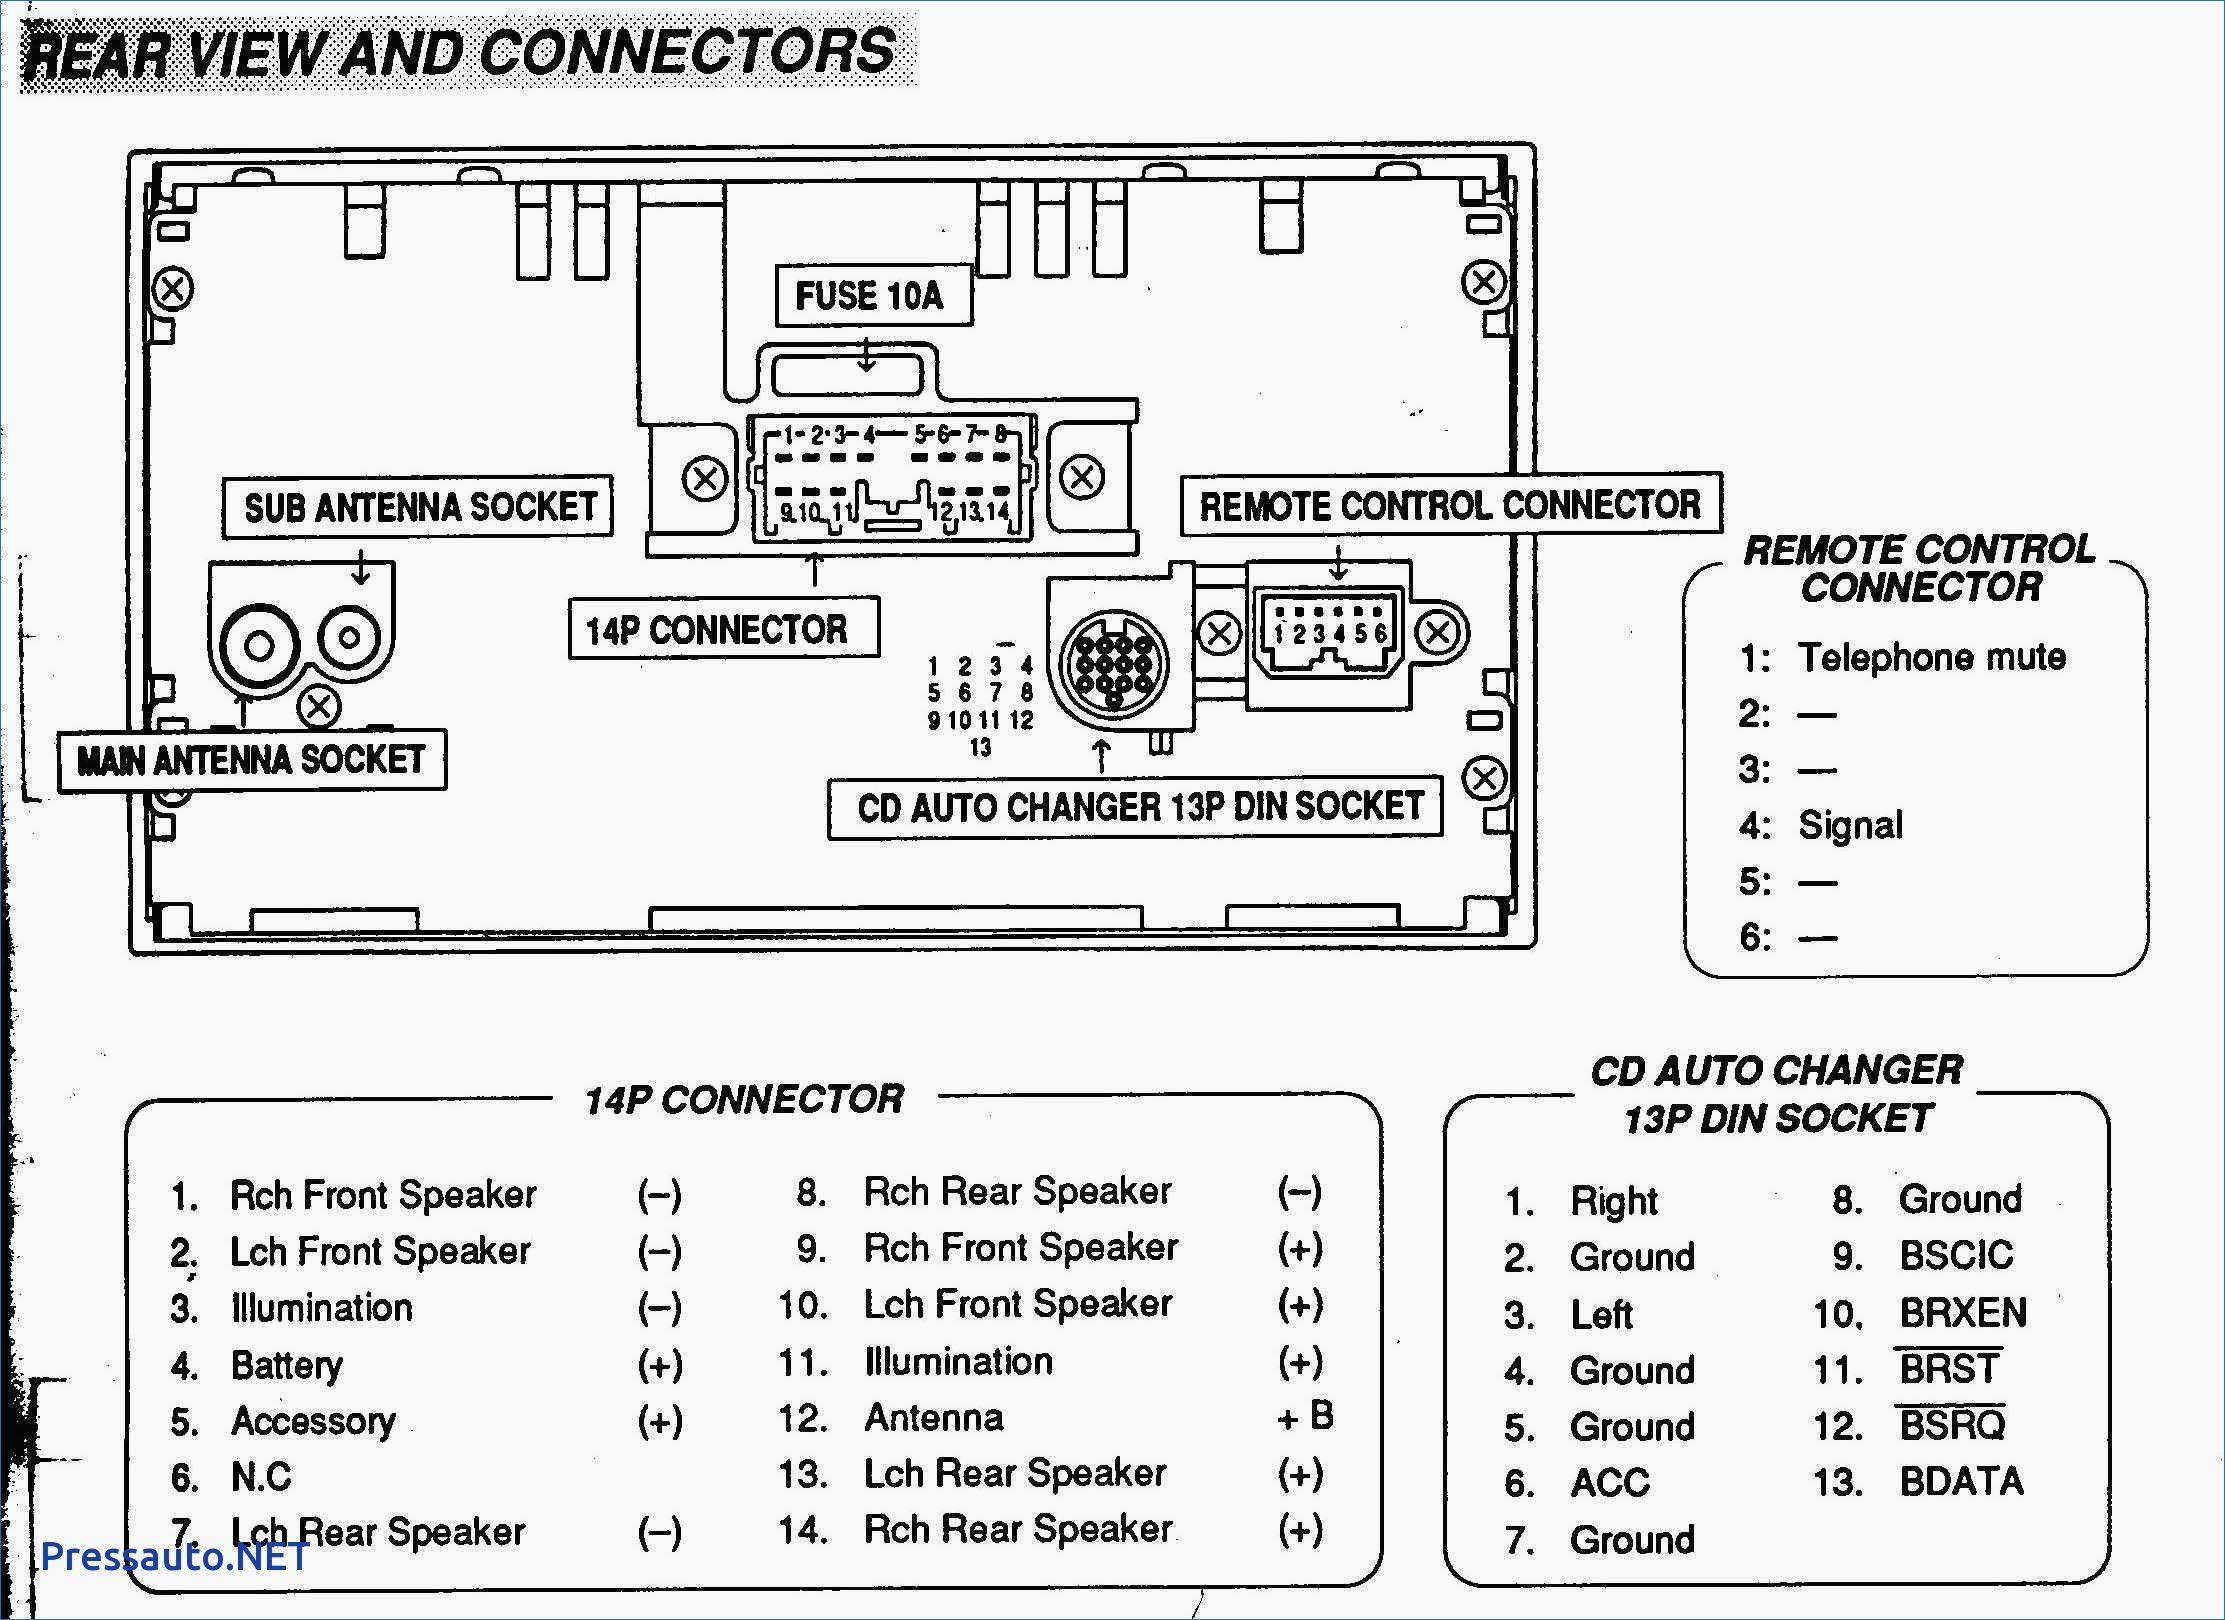 New Golf 4 1 9 Tdi Wiring Diagram Diagram Diagramsample Diagramtemplate Wiringdiagram Diagramchart W Mitsubishi Cars Electrical Wiring Diagram Car Stereo